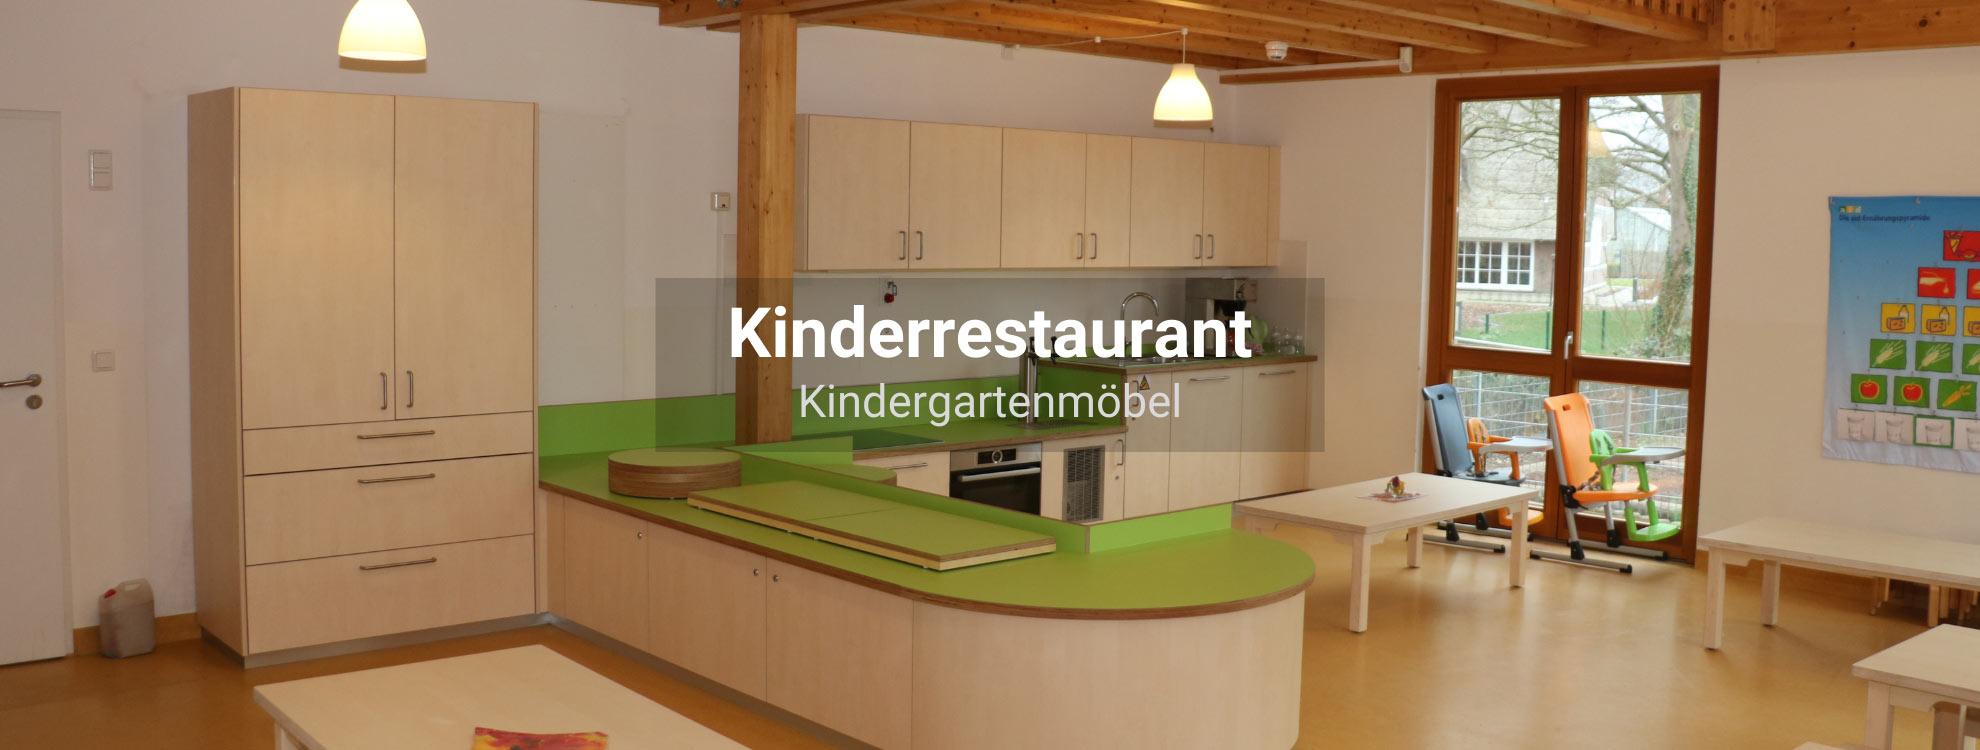 Kinderrestaurant-Kindergartenmöbel